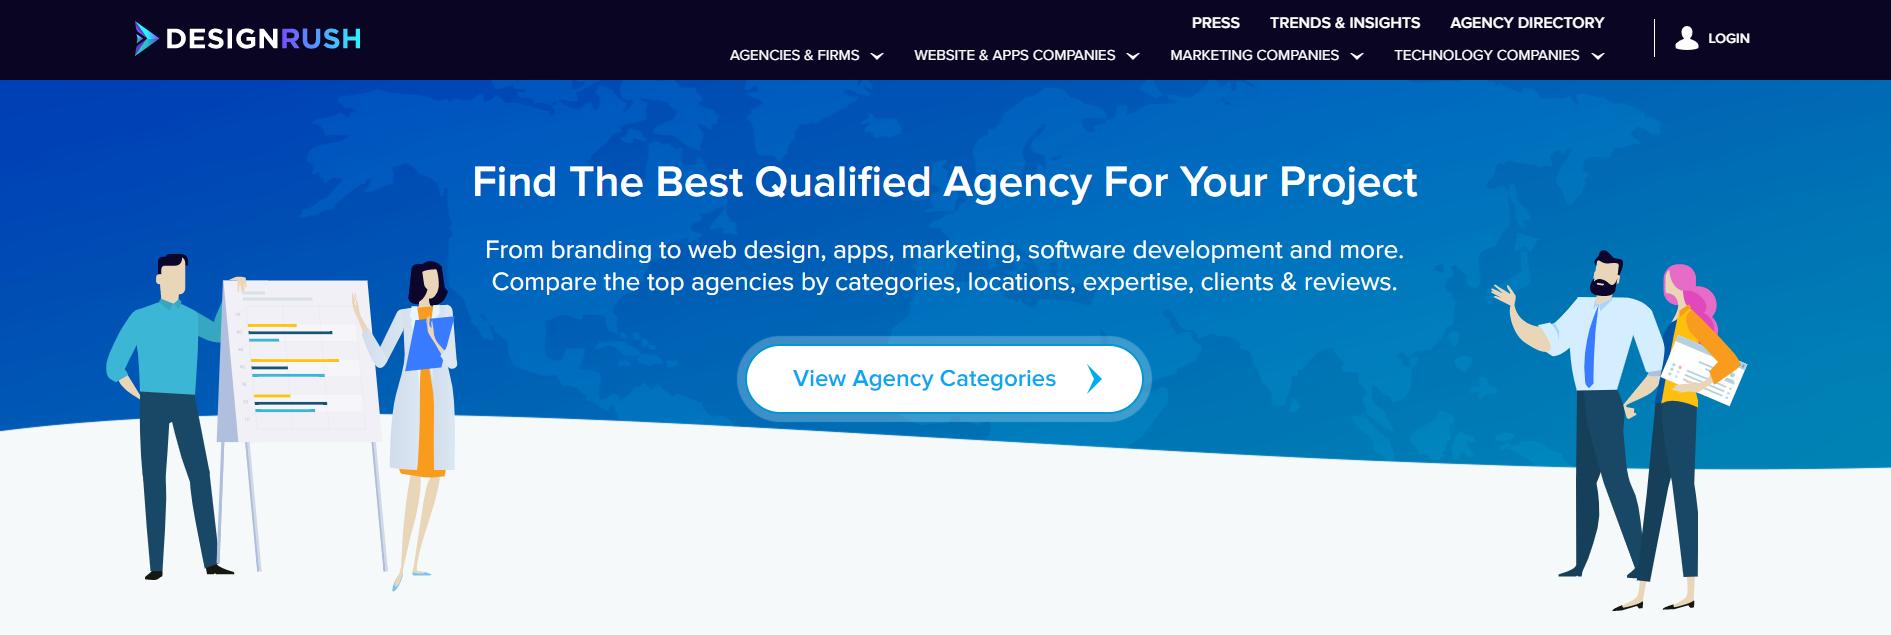 DesignRush Website screenshot